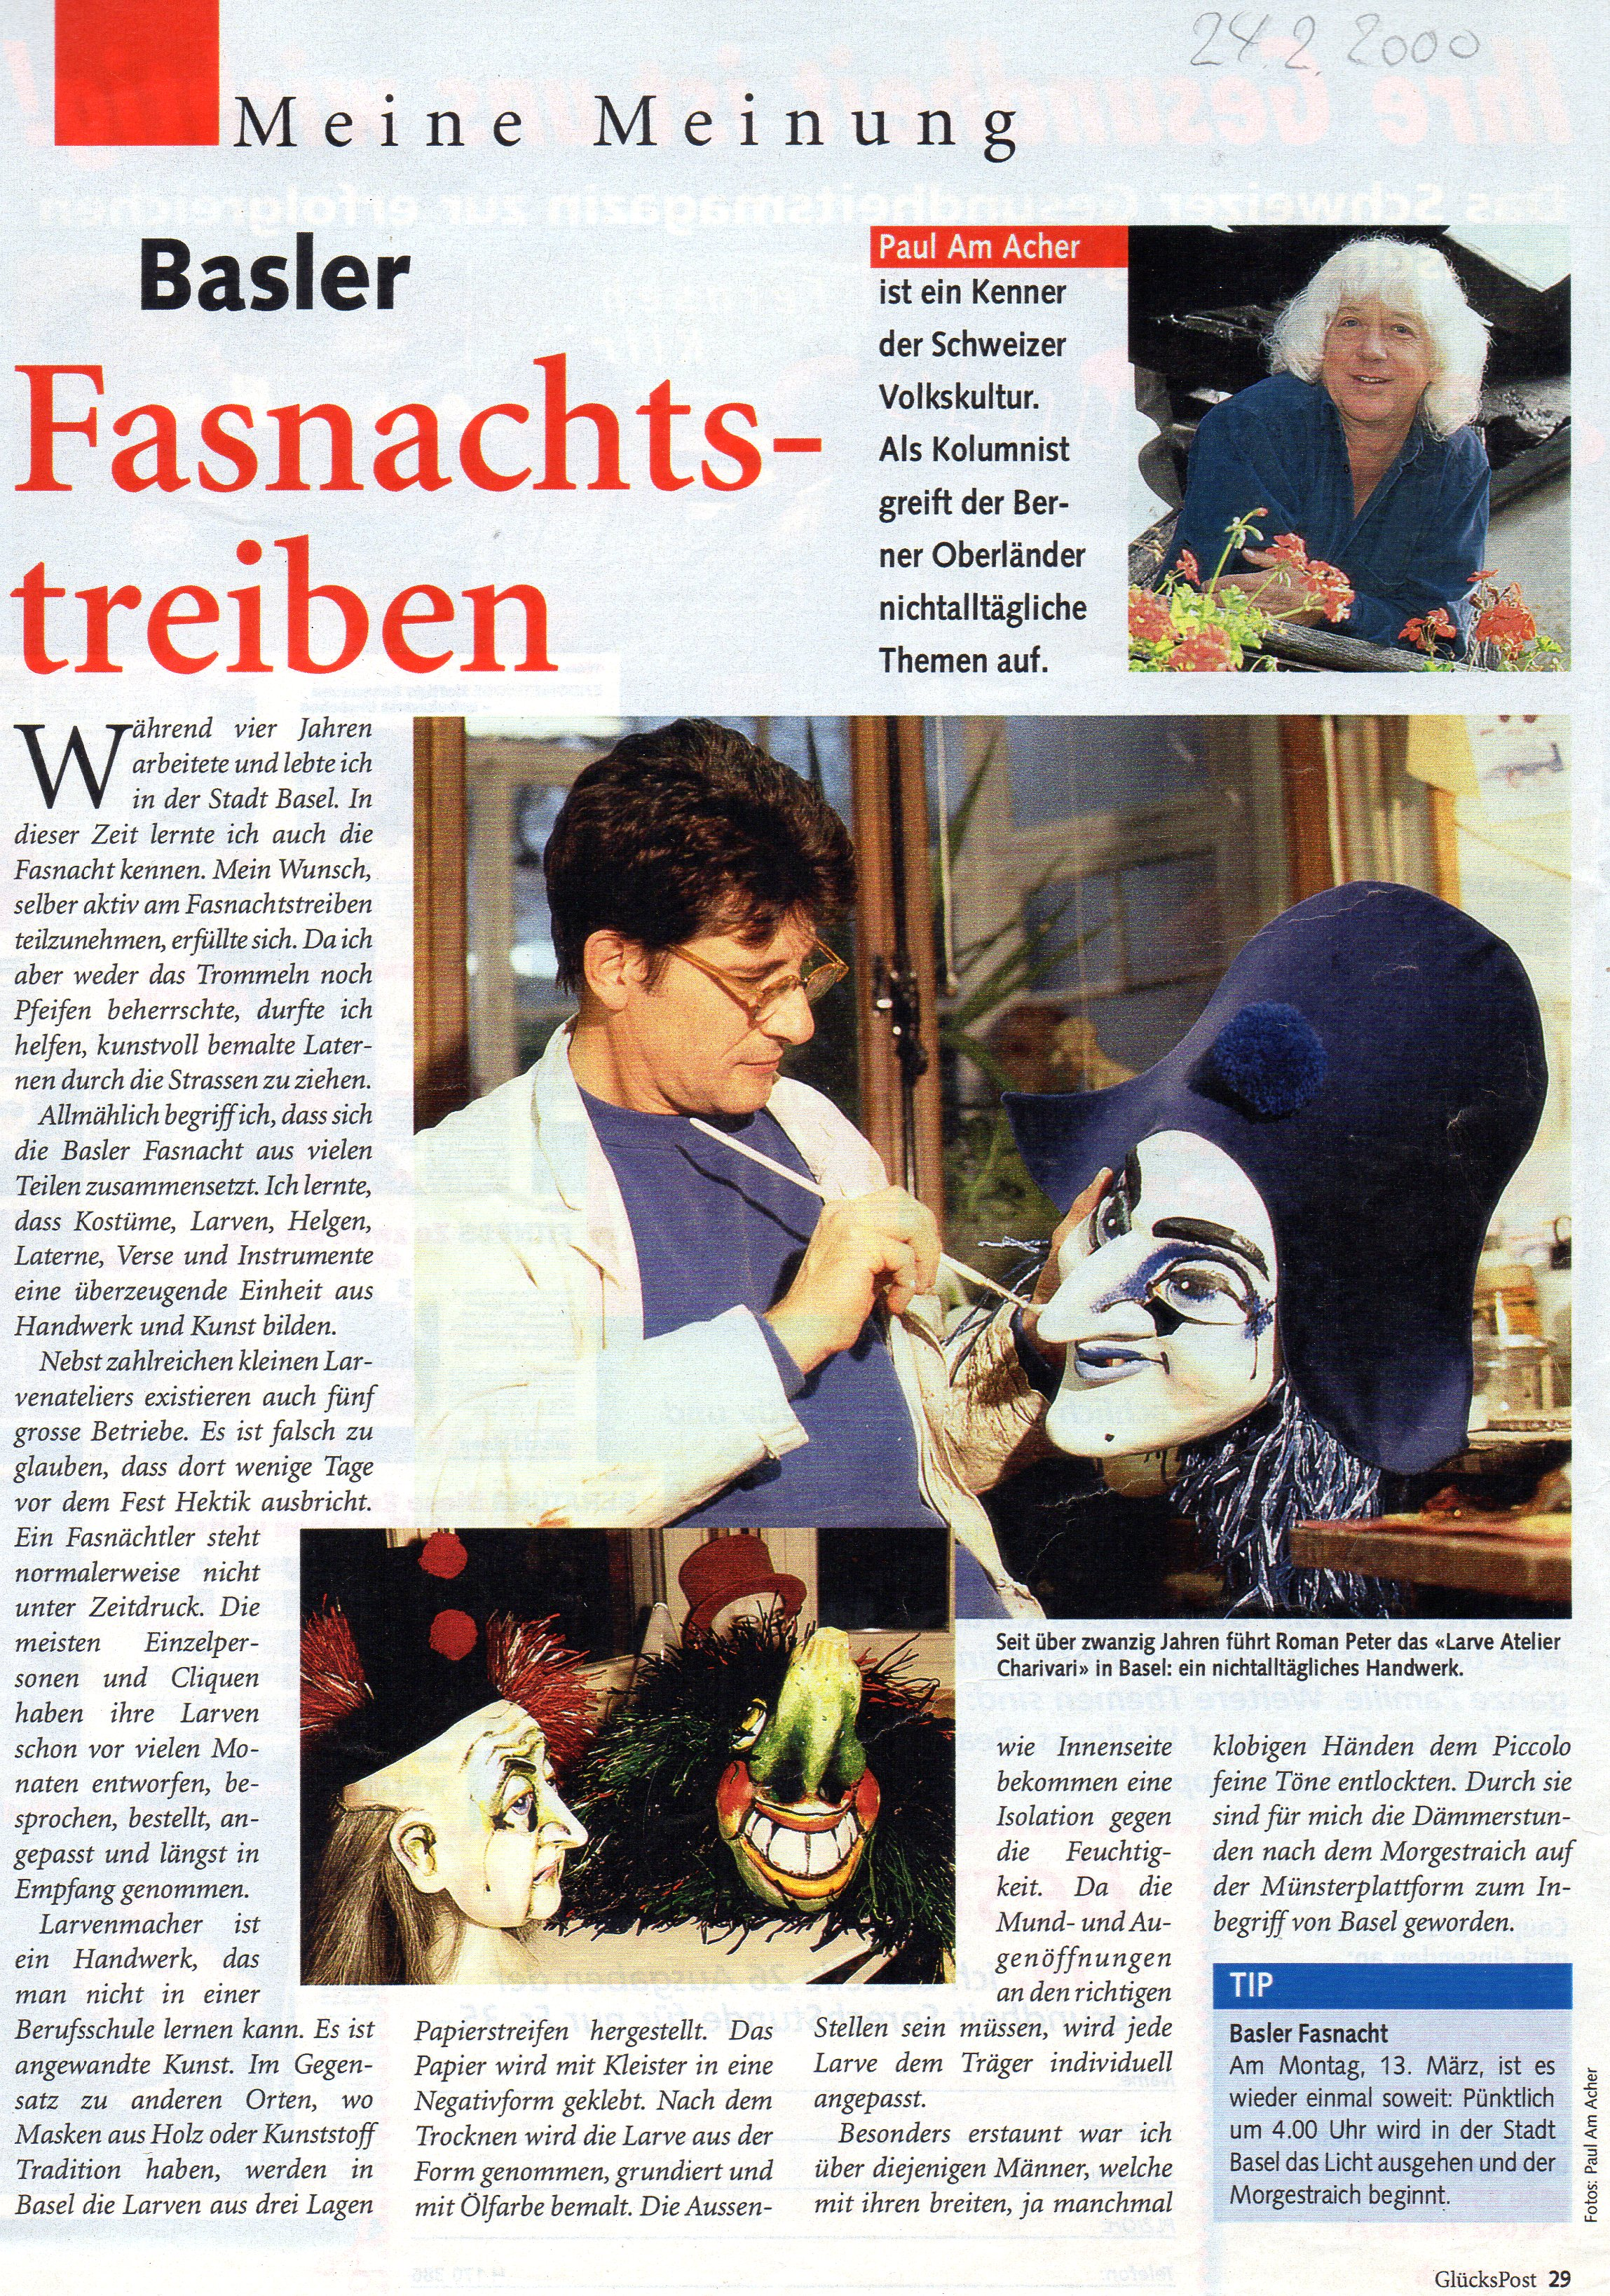 Februar 2000, Glückspost